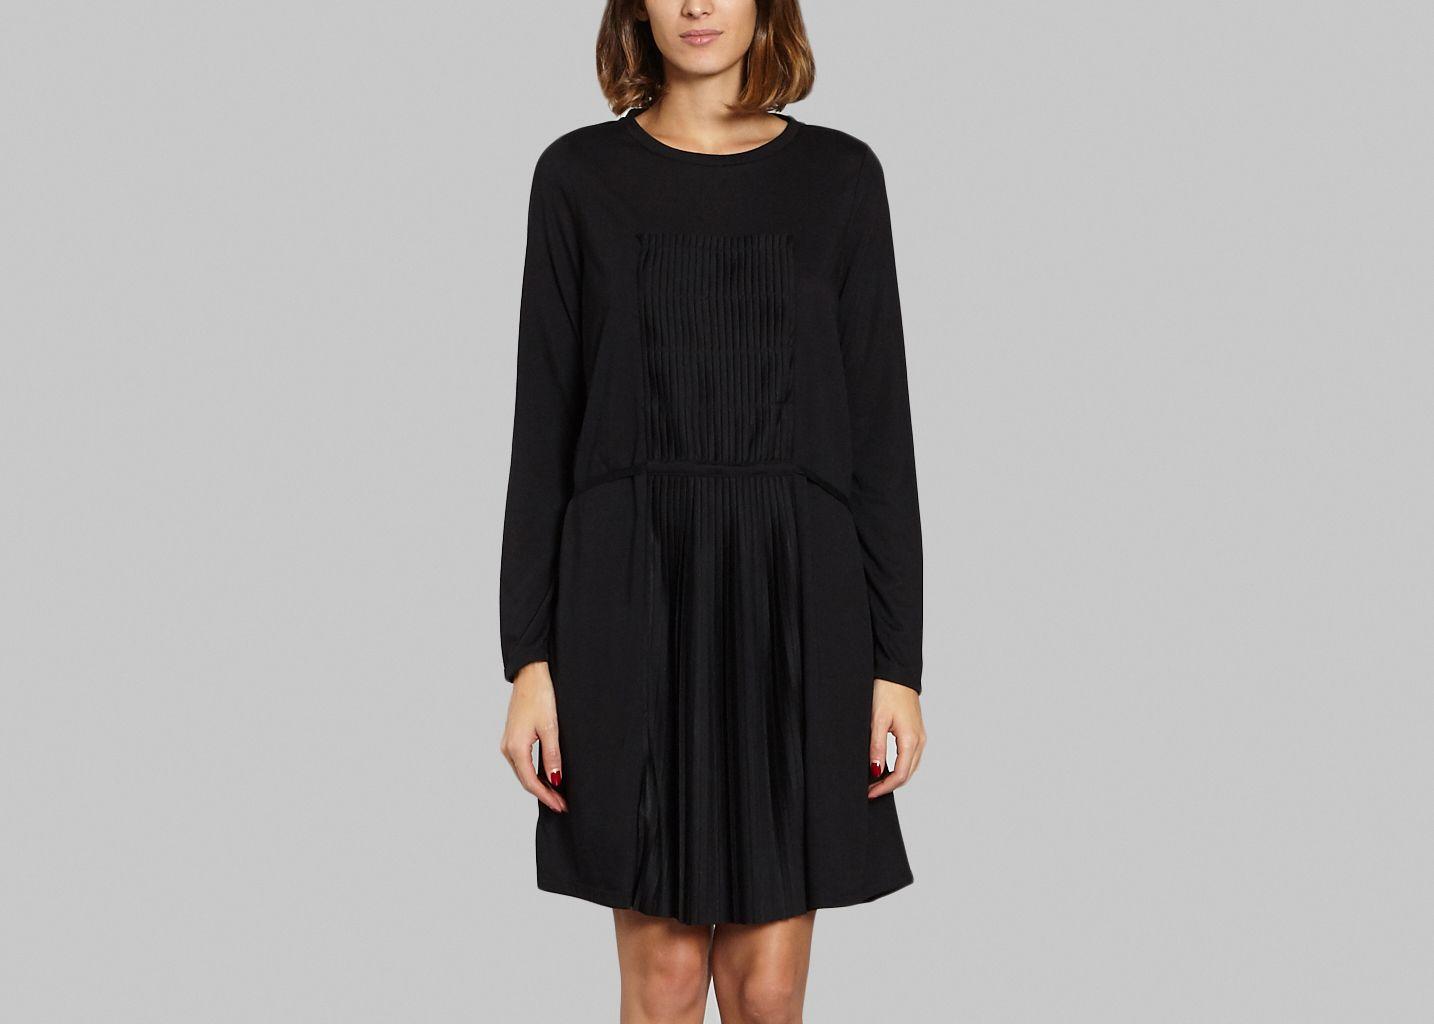 robe flemming ath vanessa bruno noir l 39 exception. Black Bedroom Furniture Sets. Home Design Ideas